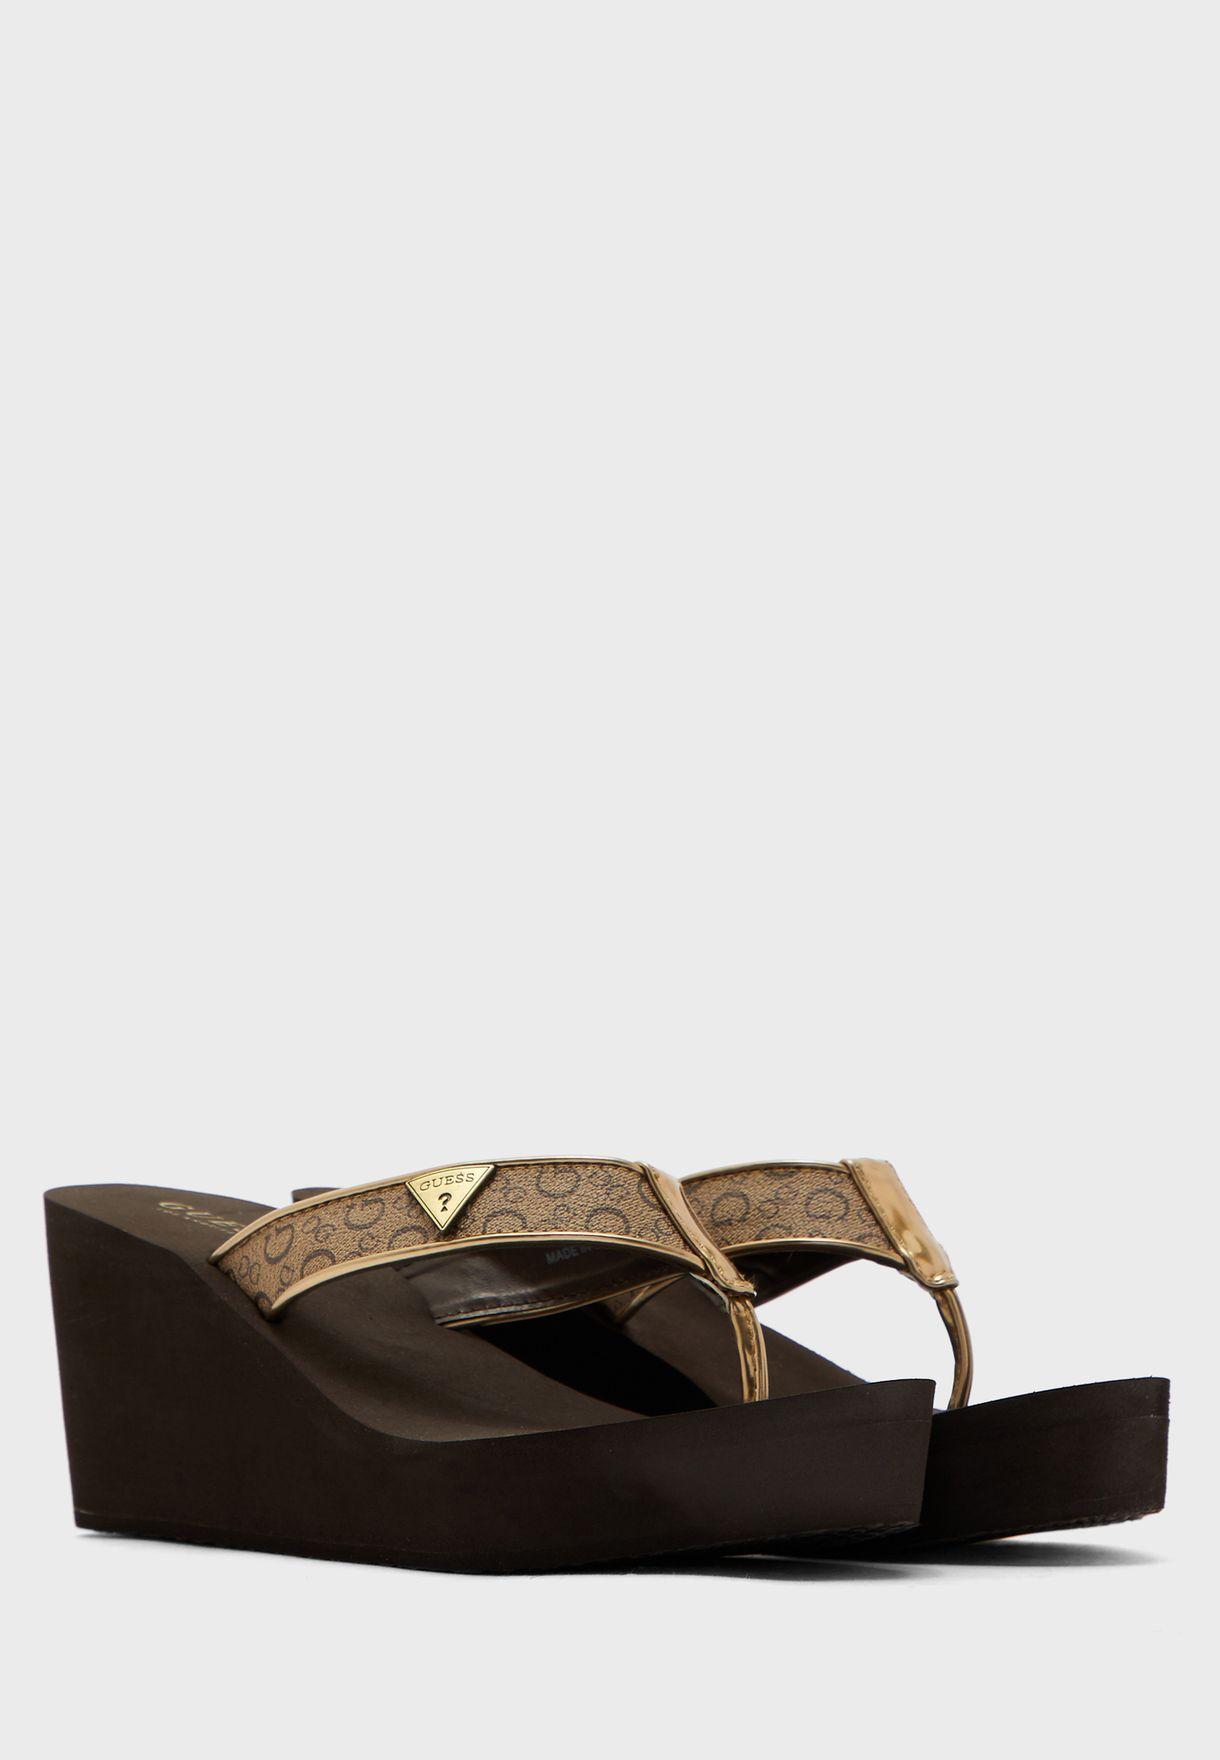 Guess Wgyarn Flat Sandal - Brand Shoes